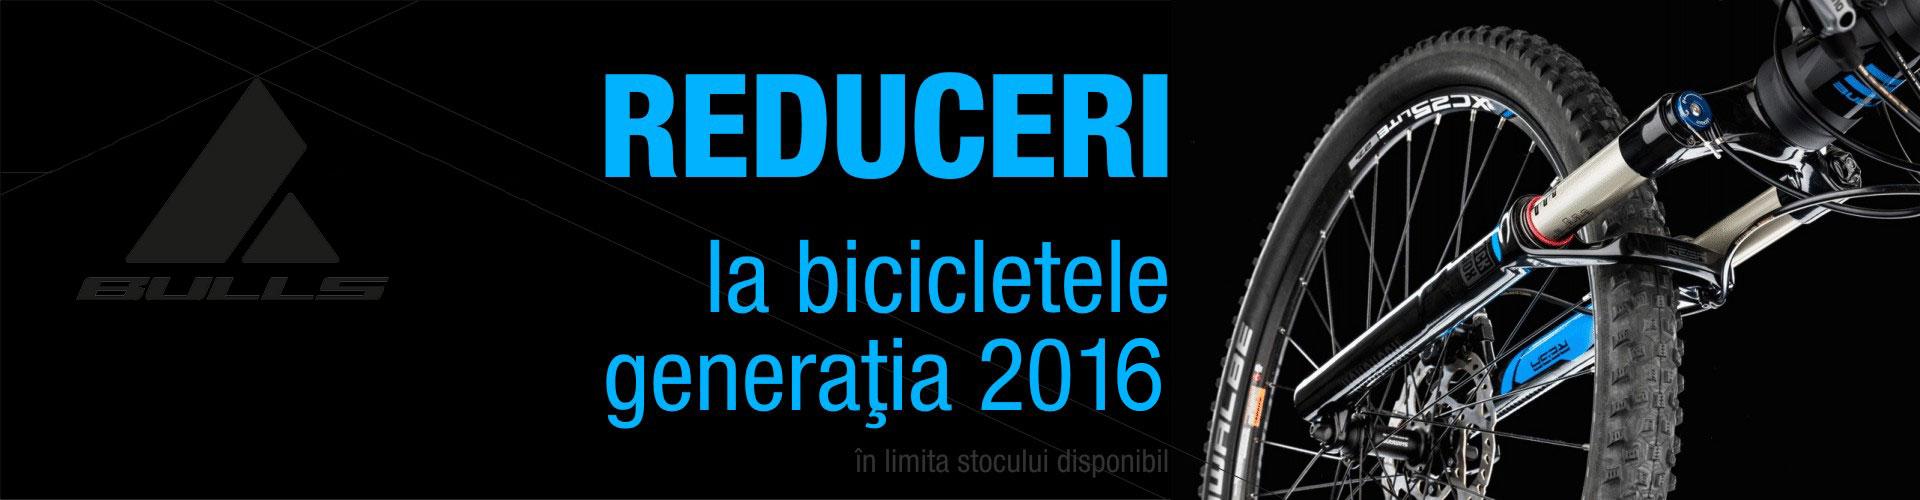 Generatia 2016